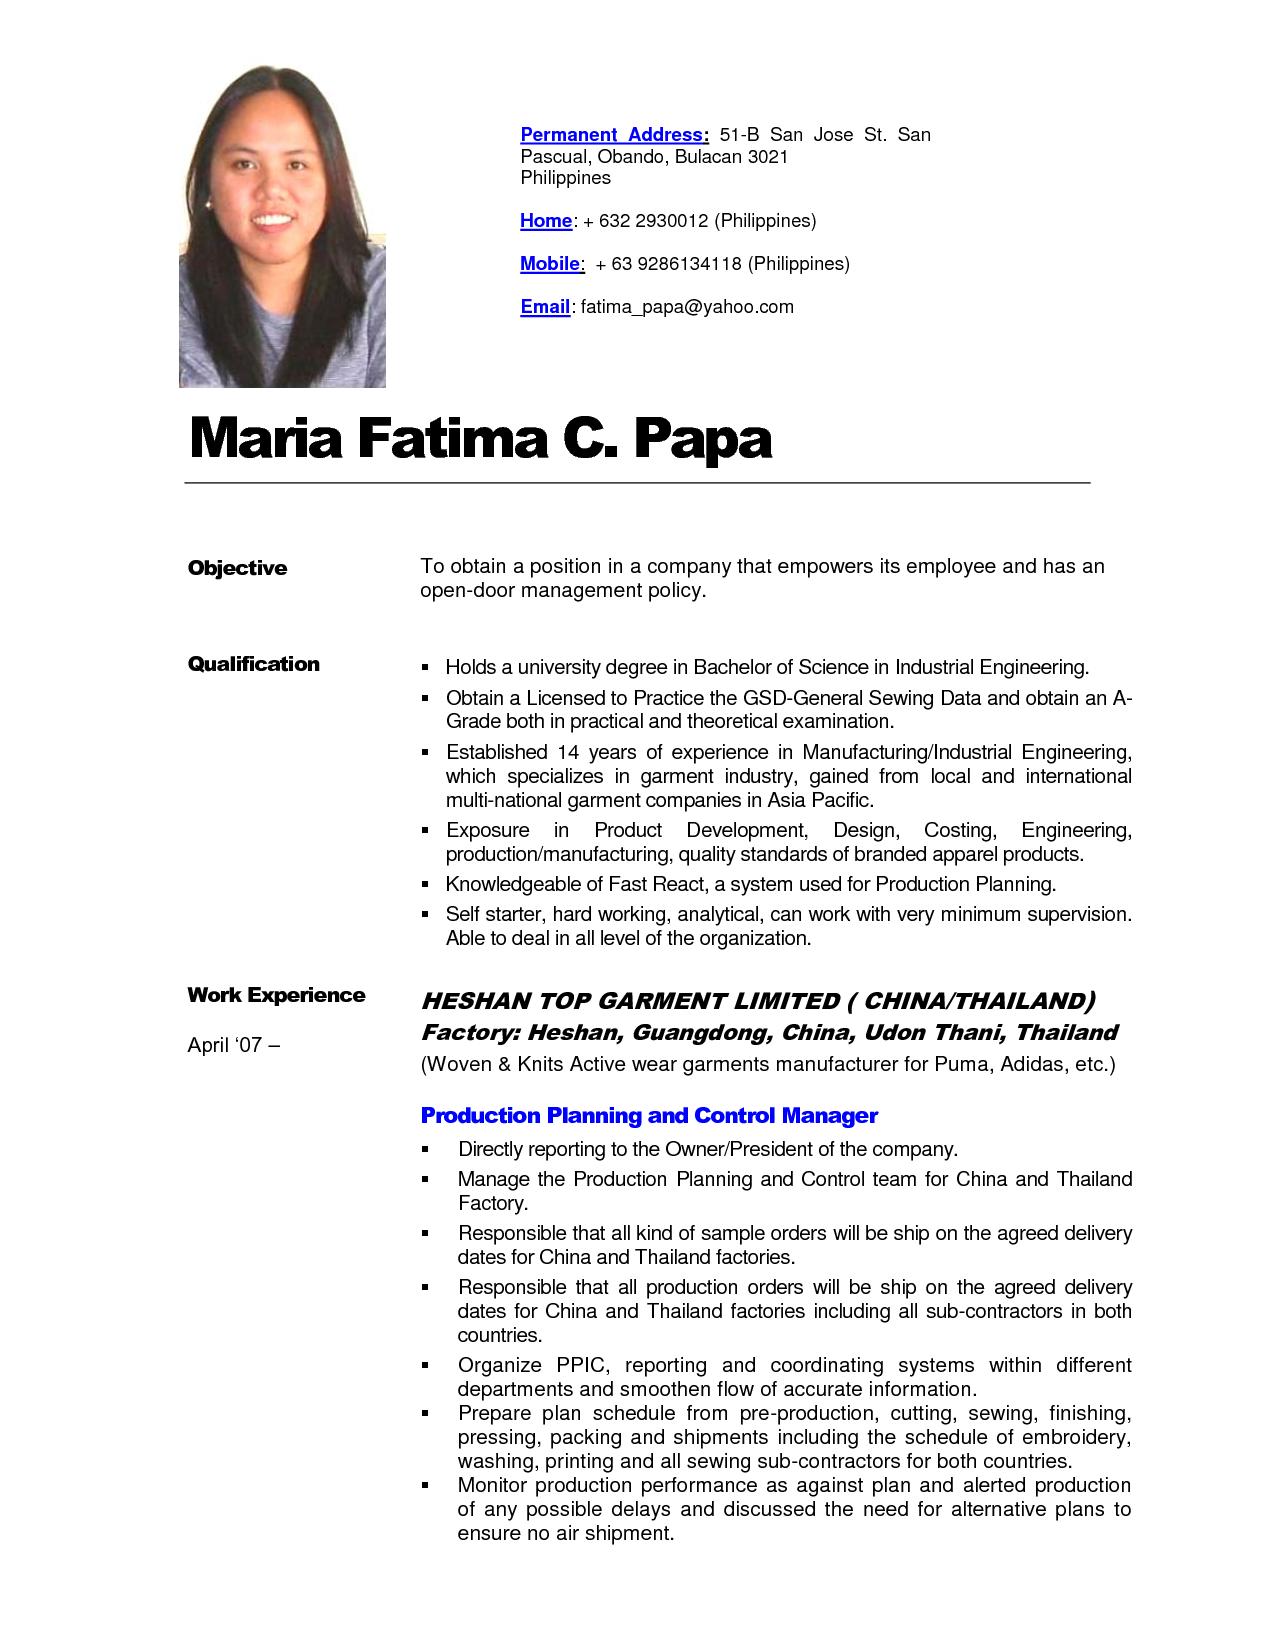 Philippines Resume Sample Resumesdesign Resume Templates Resume Basic Resume